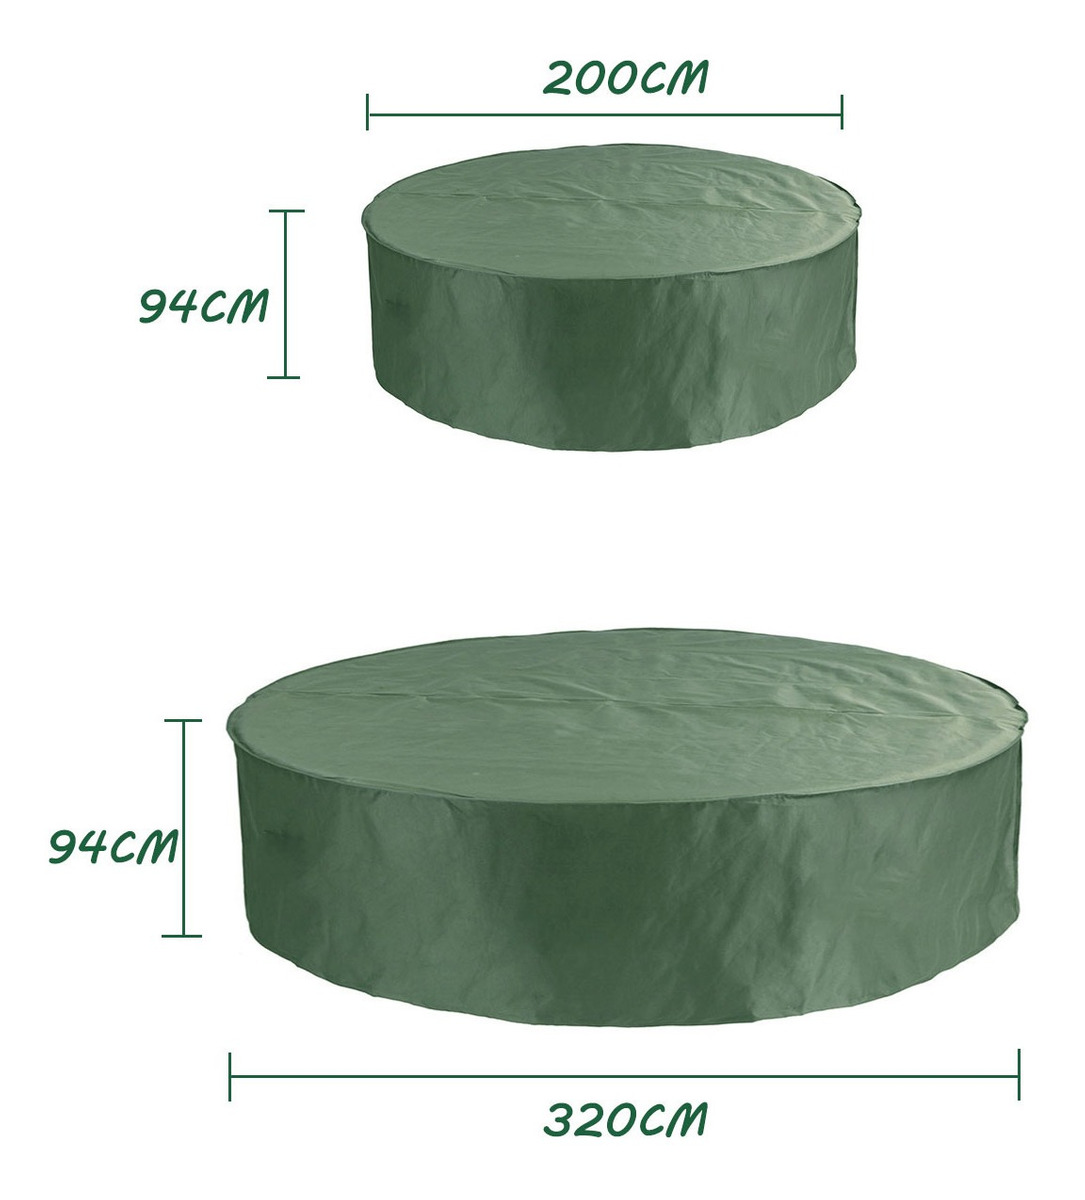 200*94//320*94cm Round Table /& Chair Set 6//8 Cover Outdoor Waterproof Dustproof